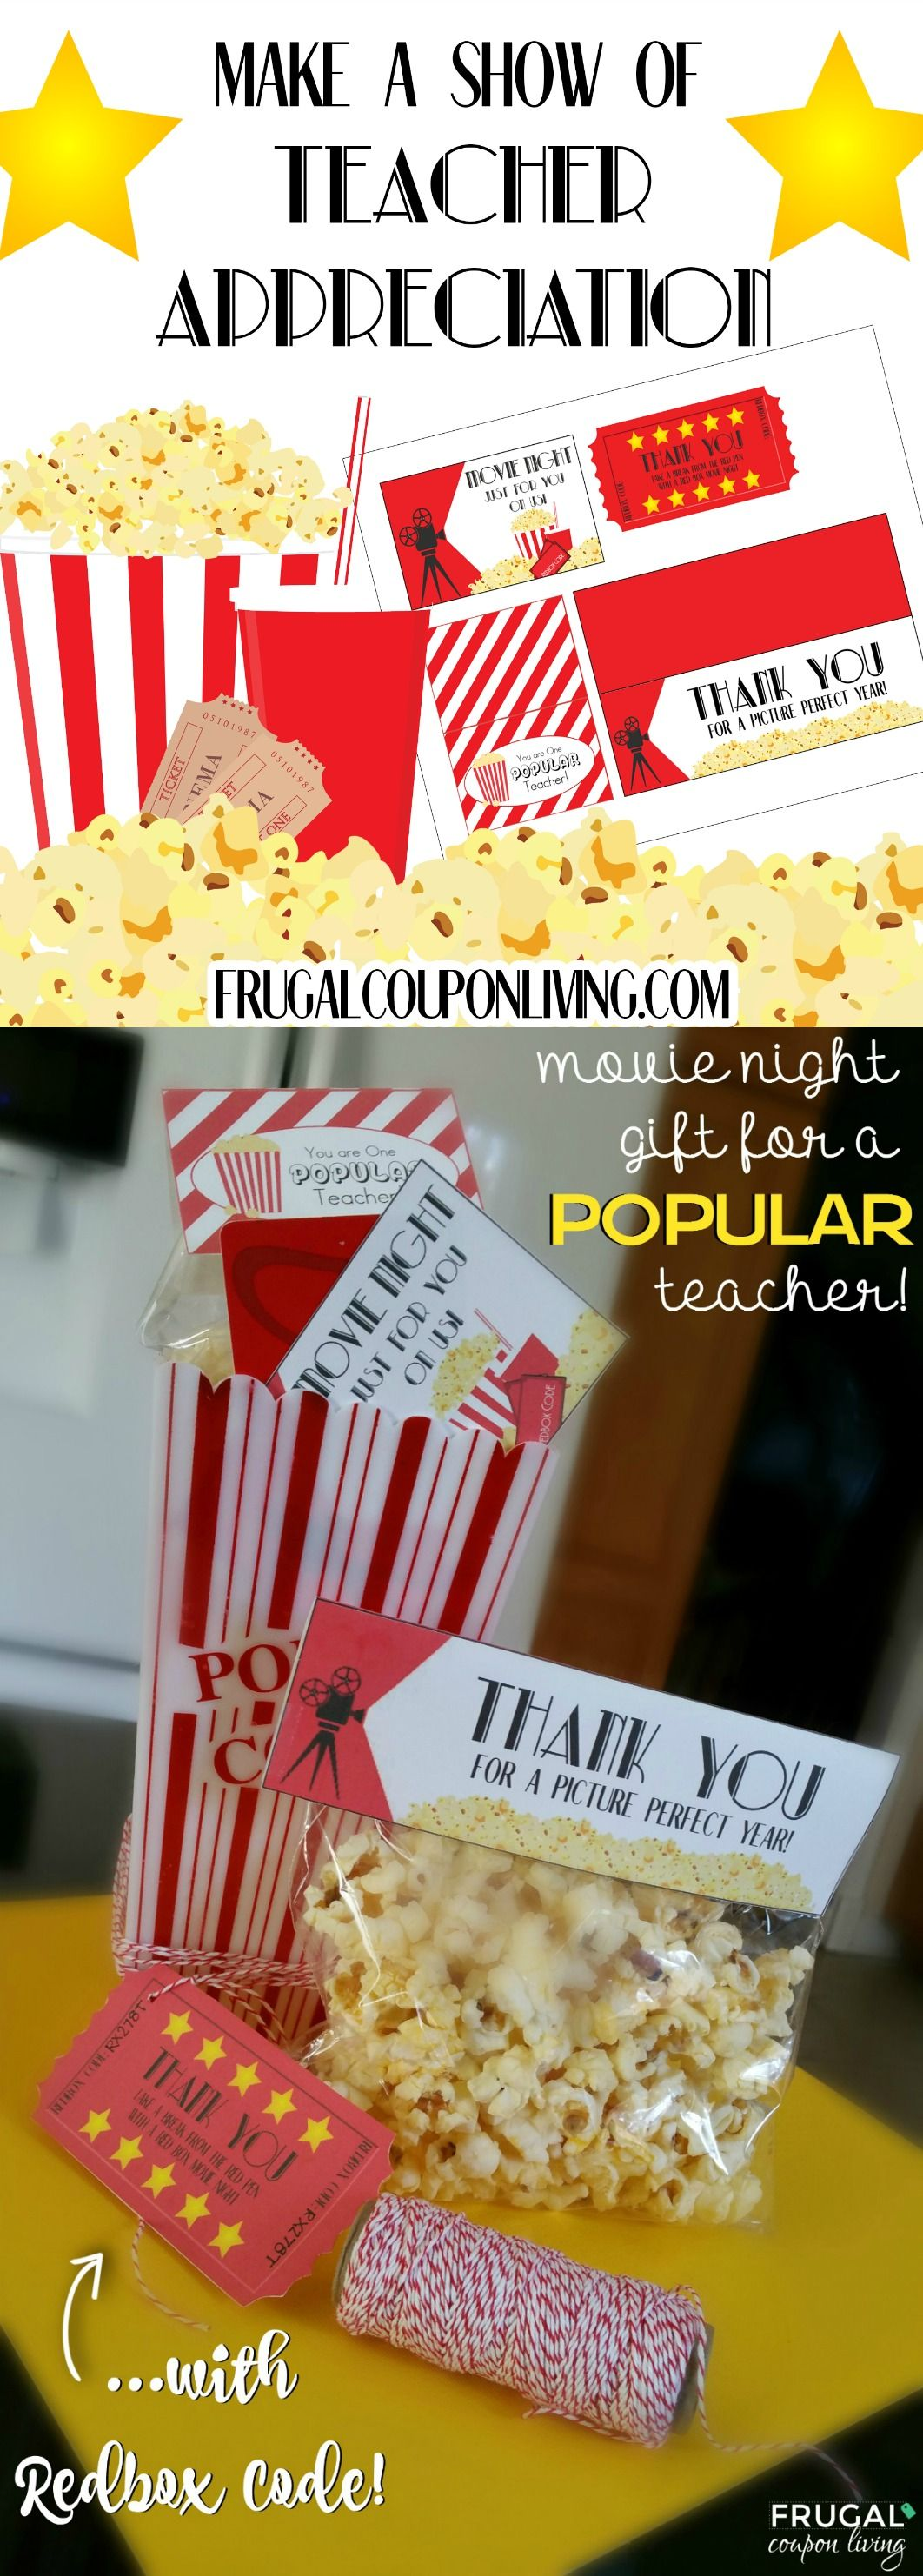 Random Happy - Gift a Redbox Movie Night | Printables | Pinterest ...